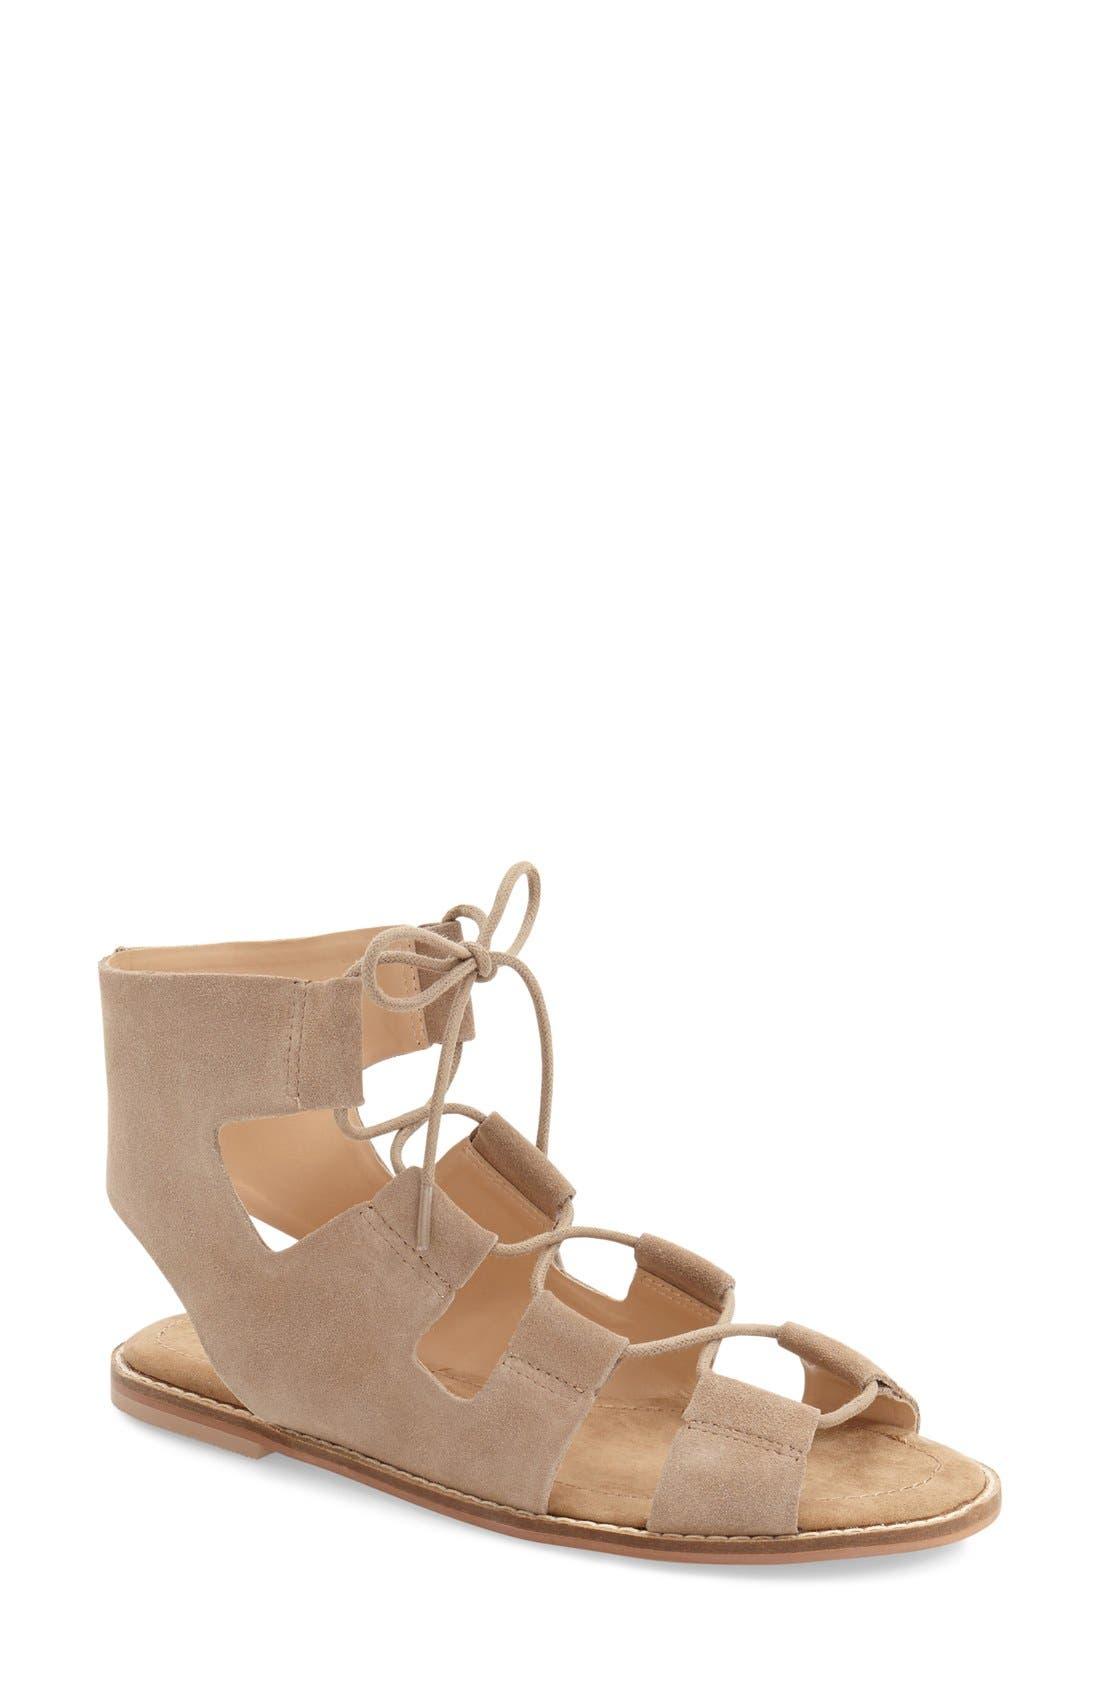 'Cady' Lace-Up Flat Sandal,                             Main thumbnail 2, color,